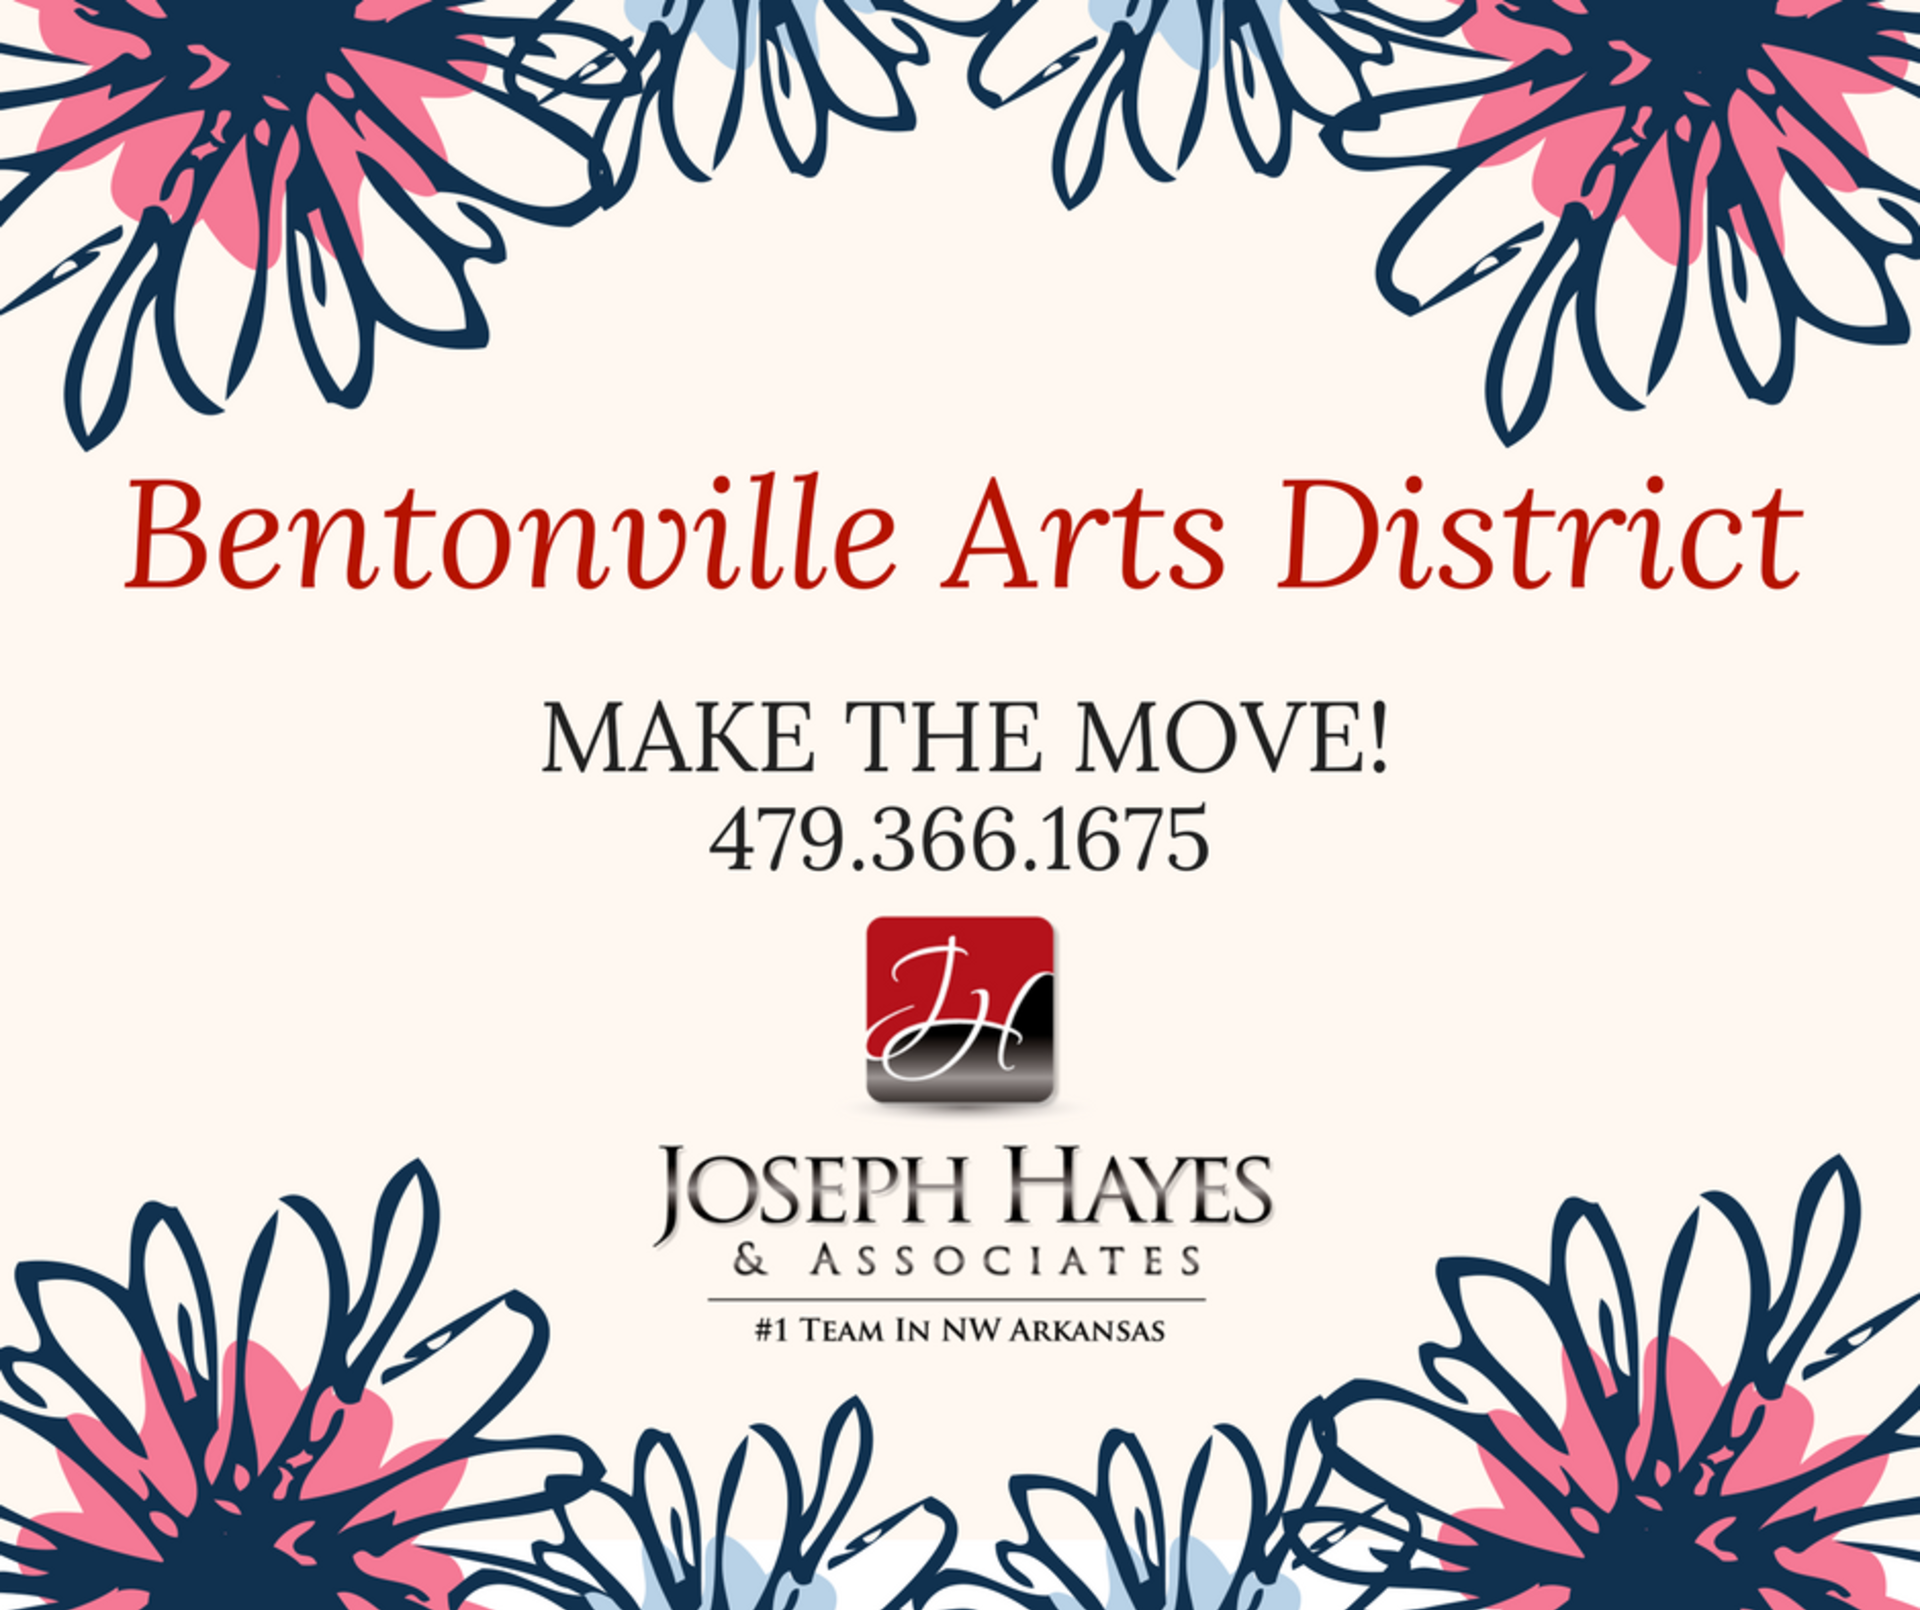 Bentonville Arts District